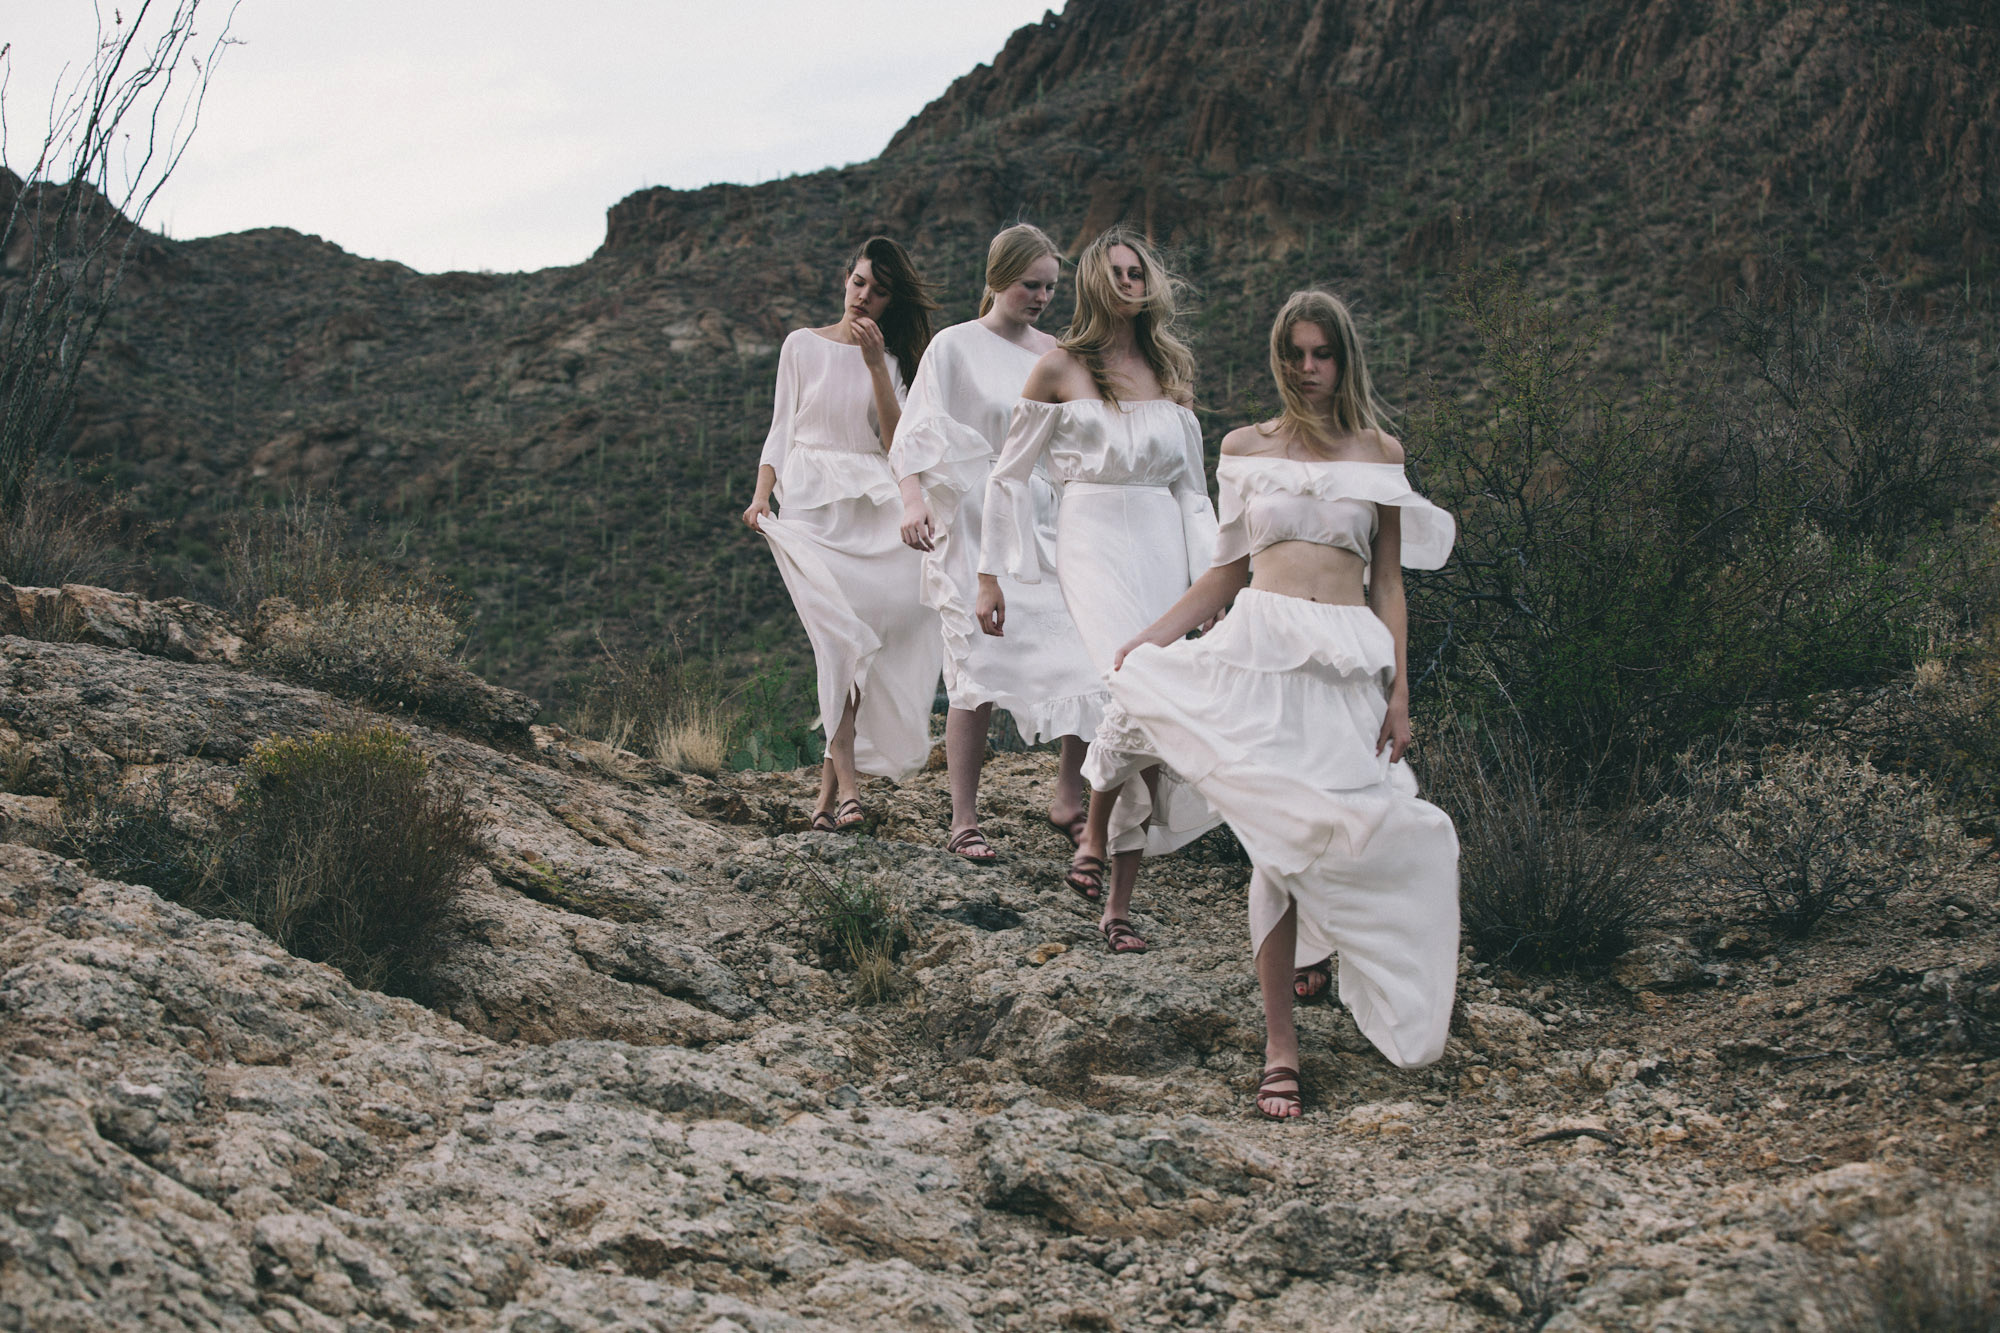 CopyrightBonJane Photography modern new york artist cult boho bohemian models nakid magazine i-d female white dress wedding sexy babes desert naked georges berges gallery moma